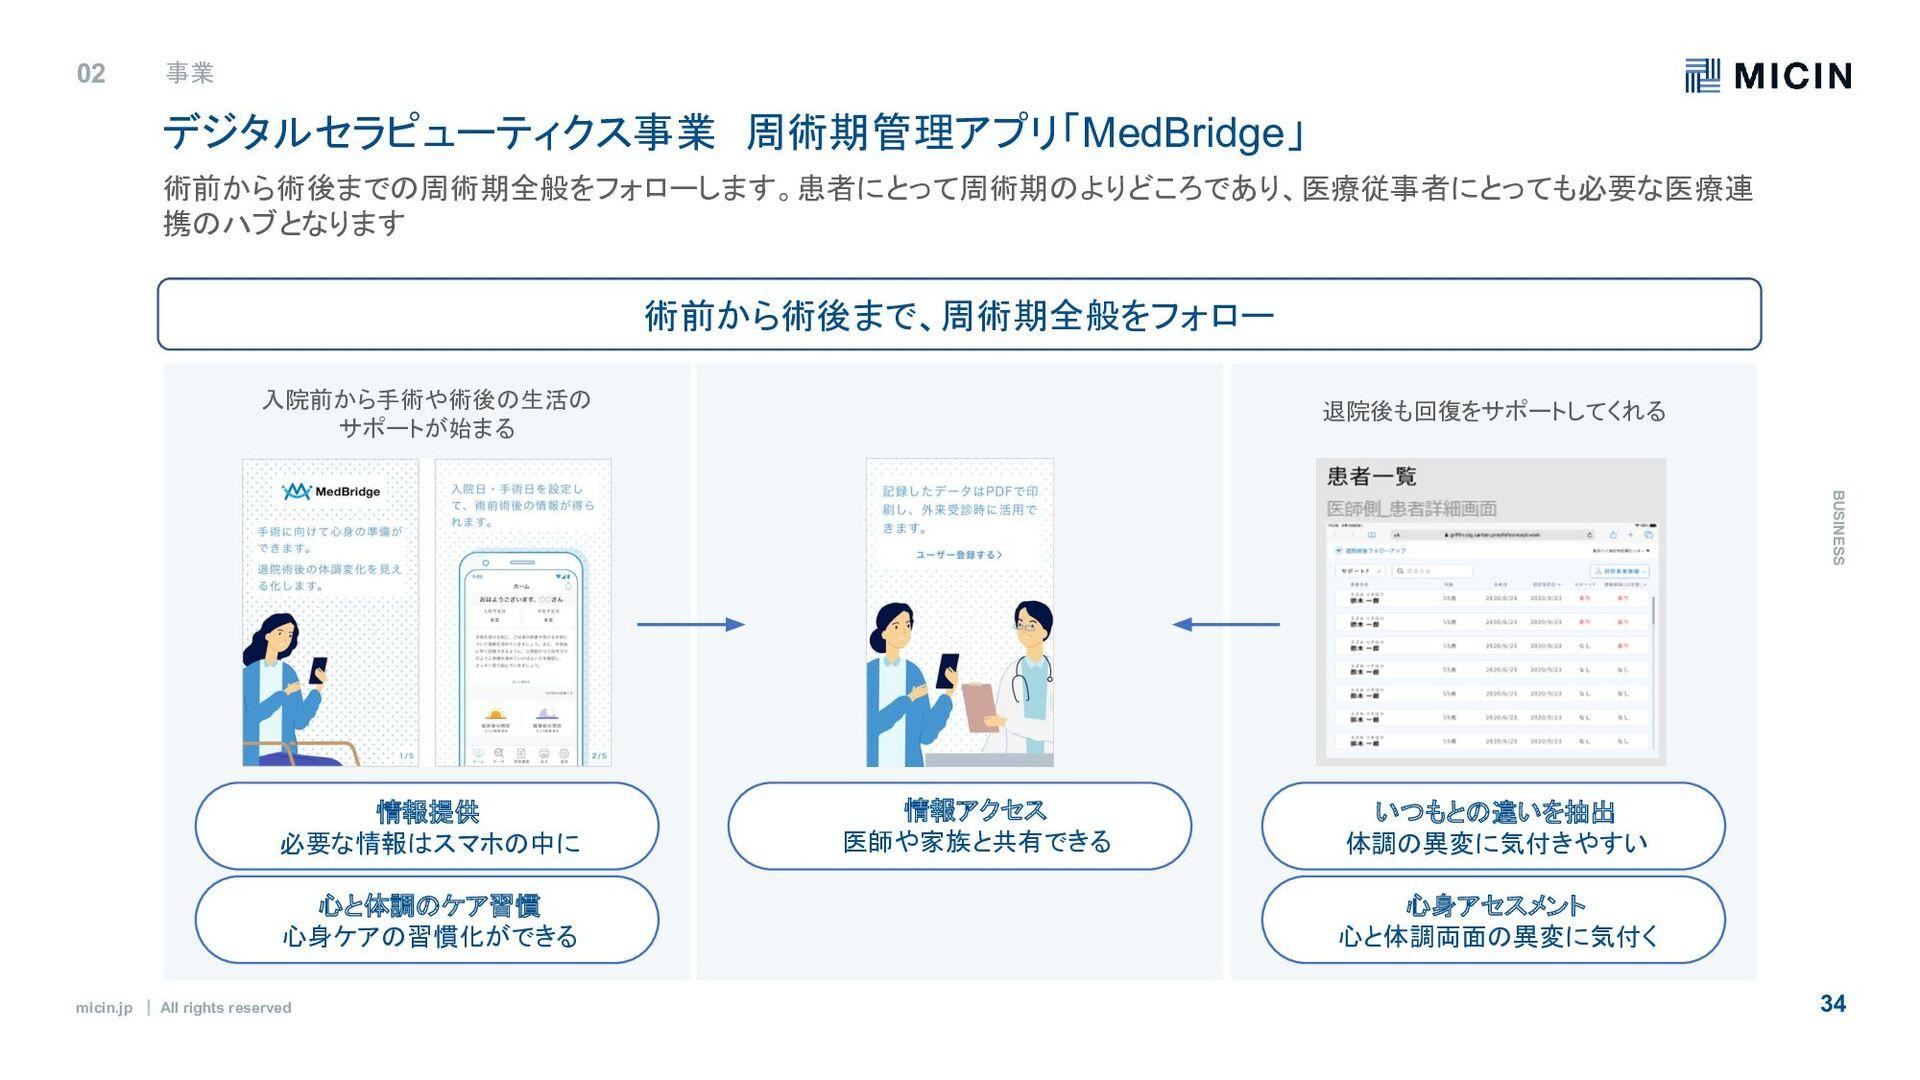 micin.jp ʛ All rights reserved 34 ϝϯόʔհ 03 K.I...